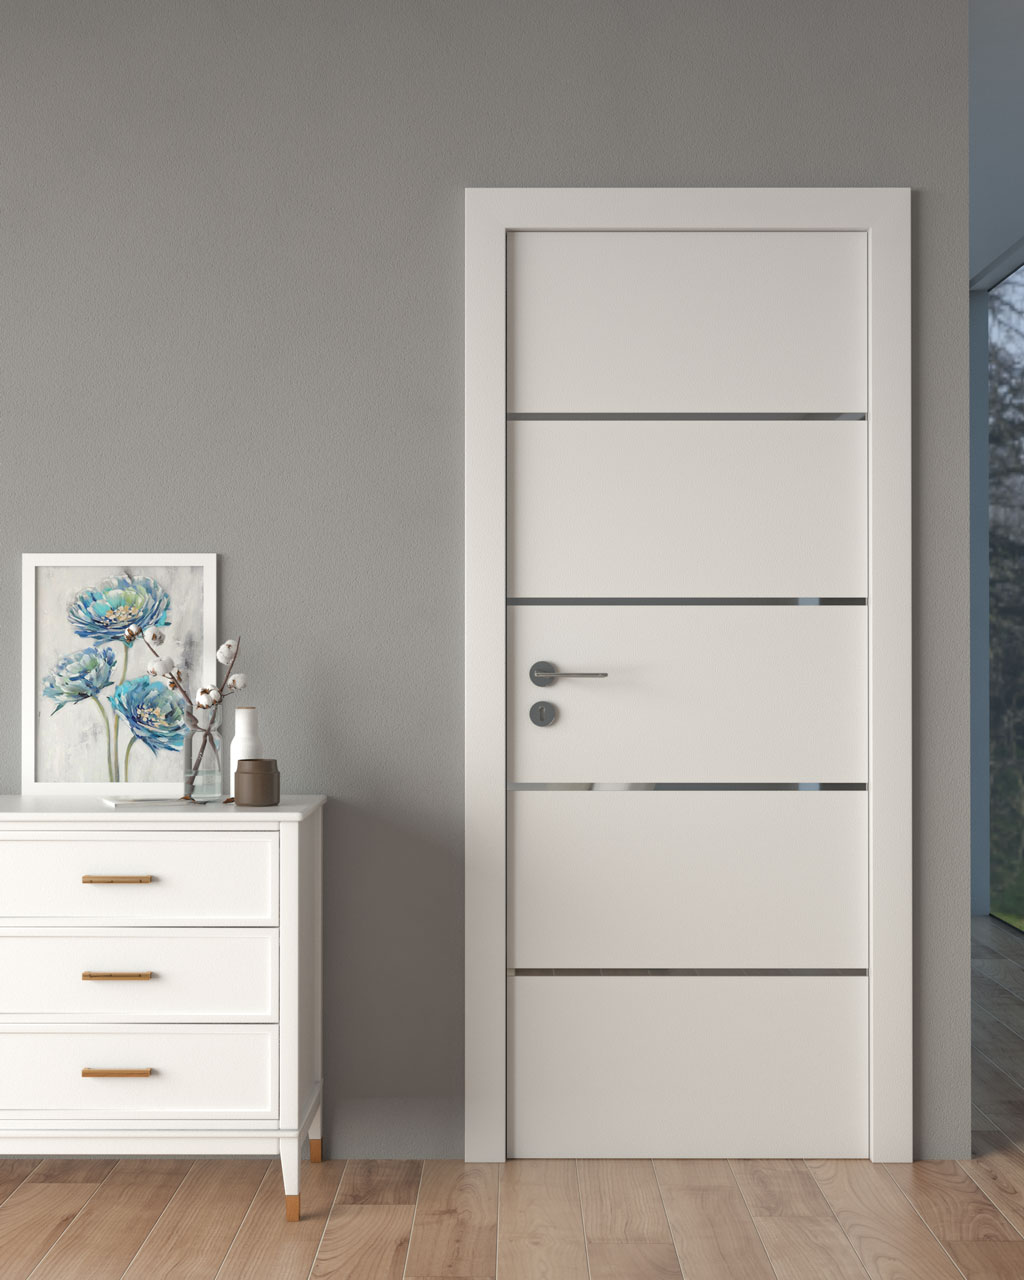 White door with gray walls